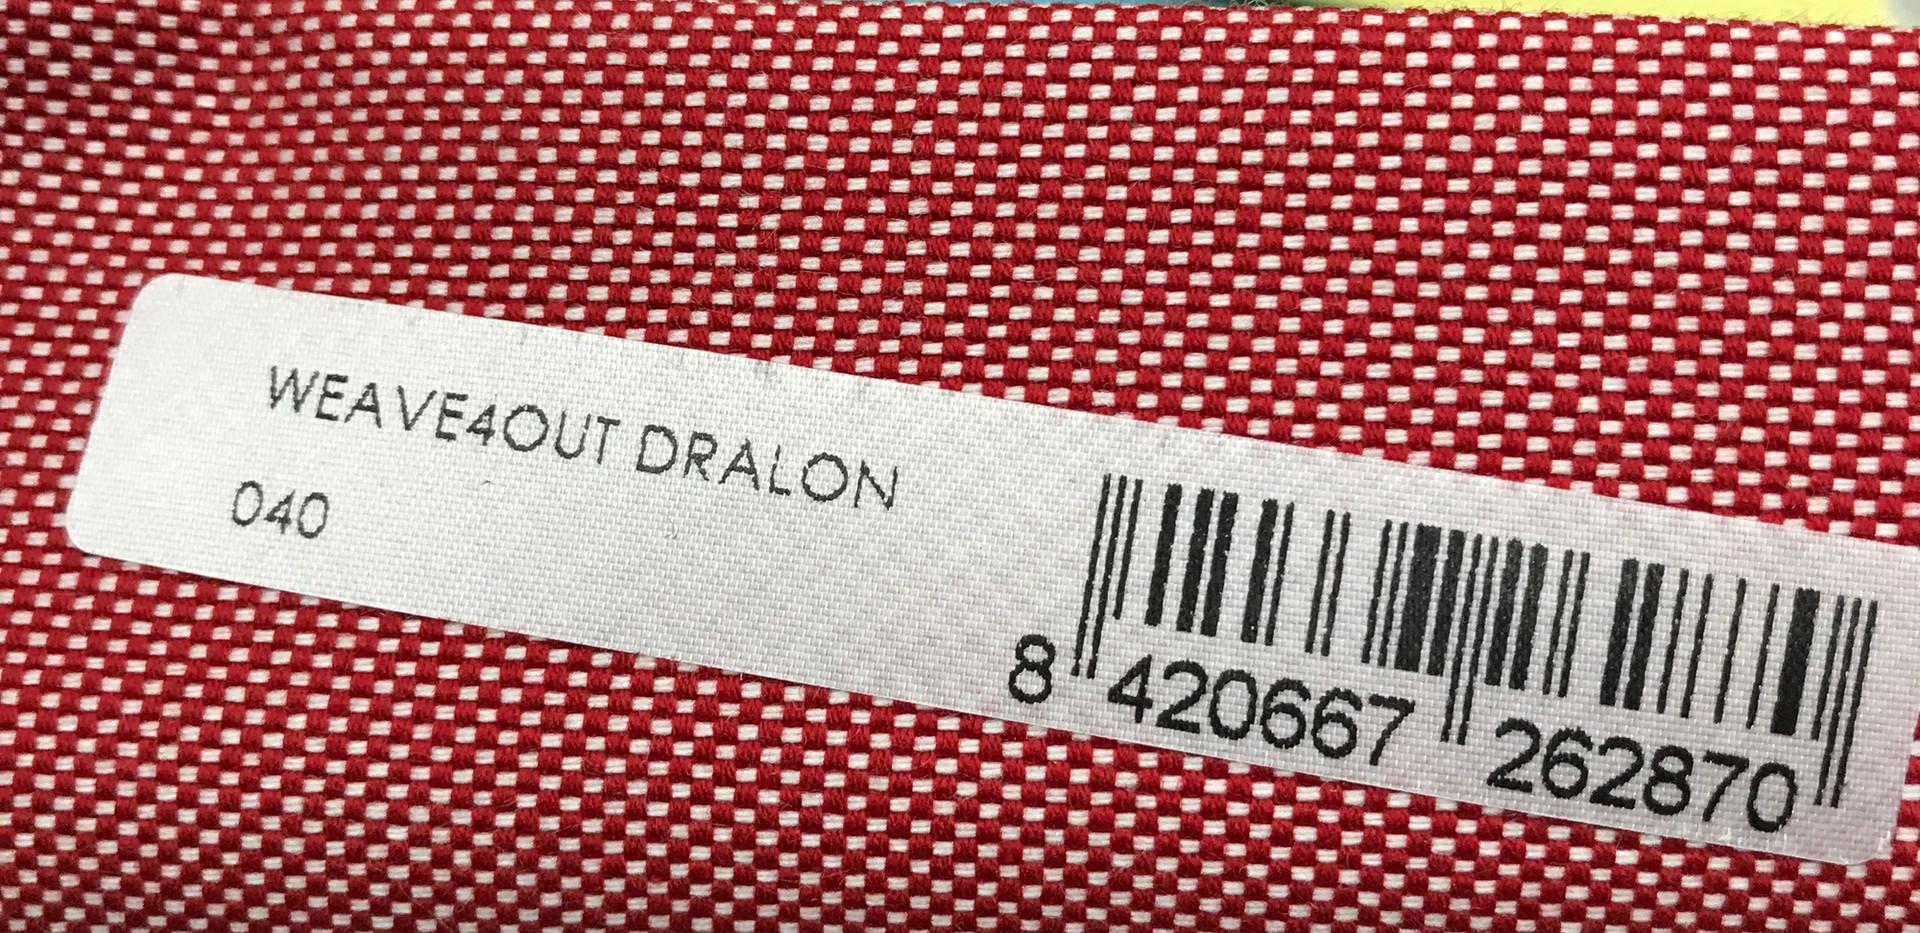 WEAVE4 OUT DRALON 040.JPG